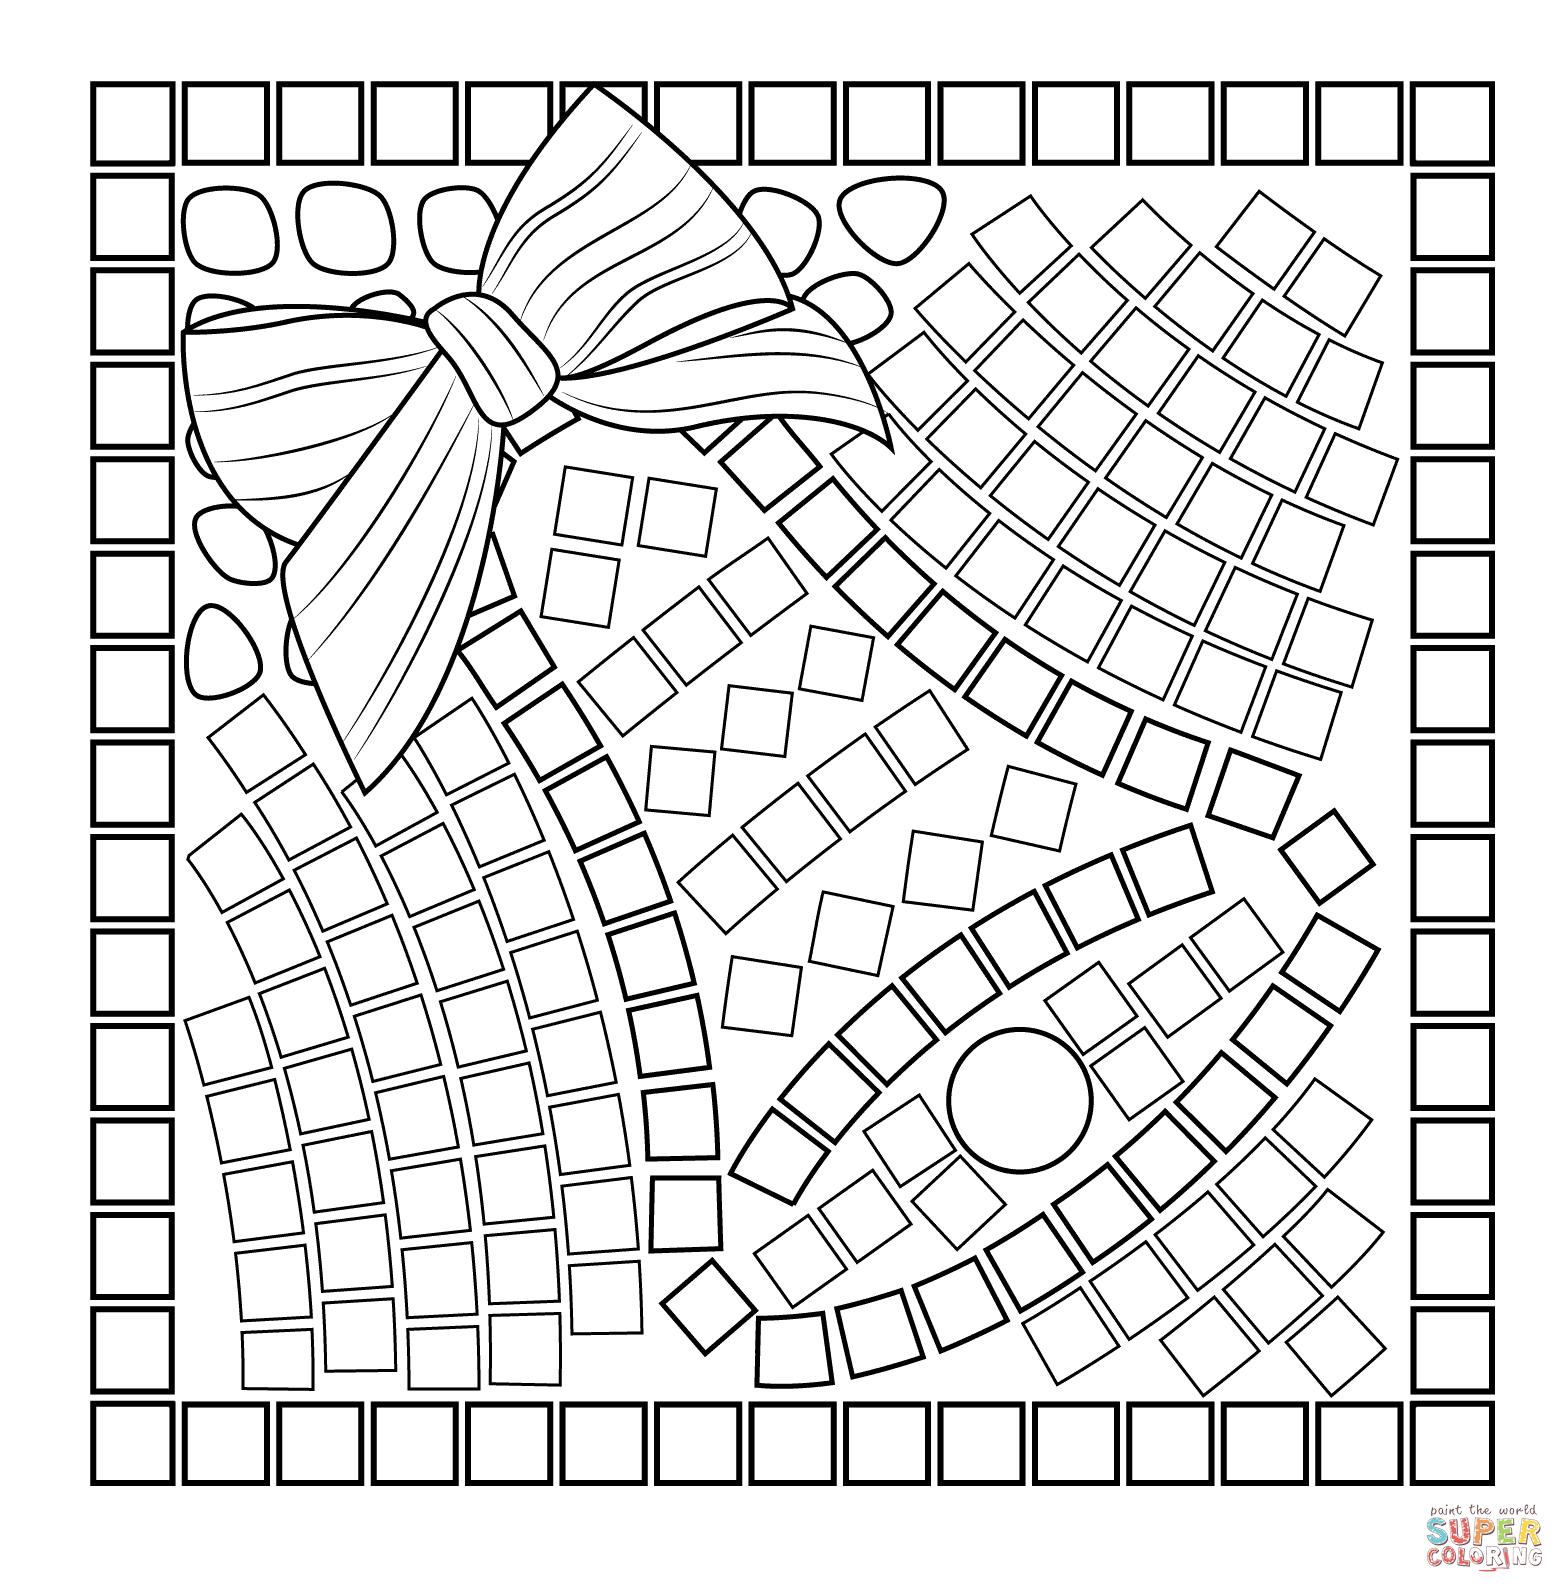 mosaics coloring pages - photo#14